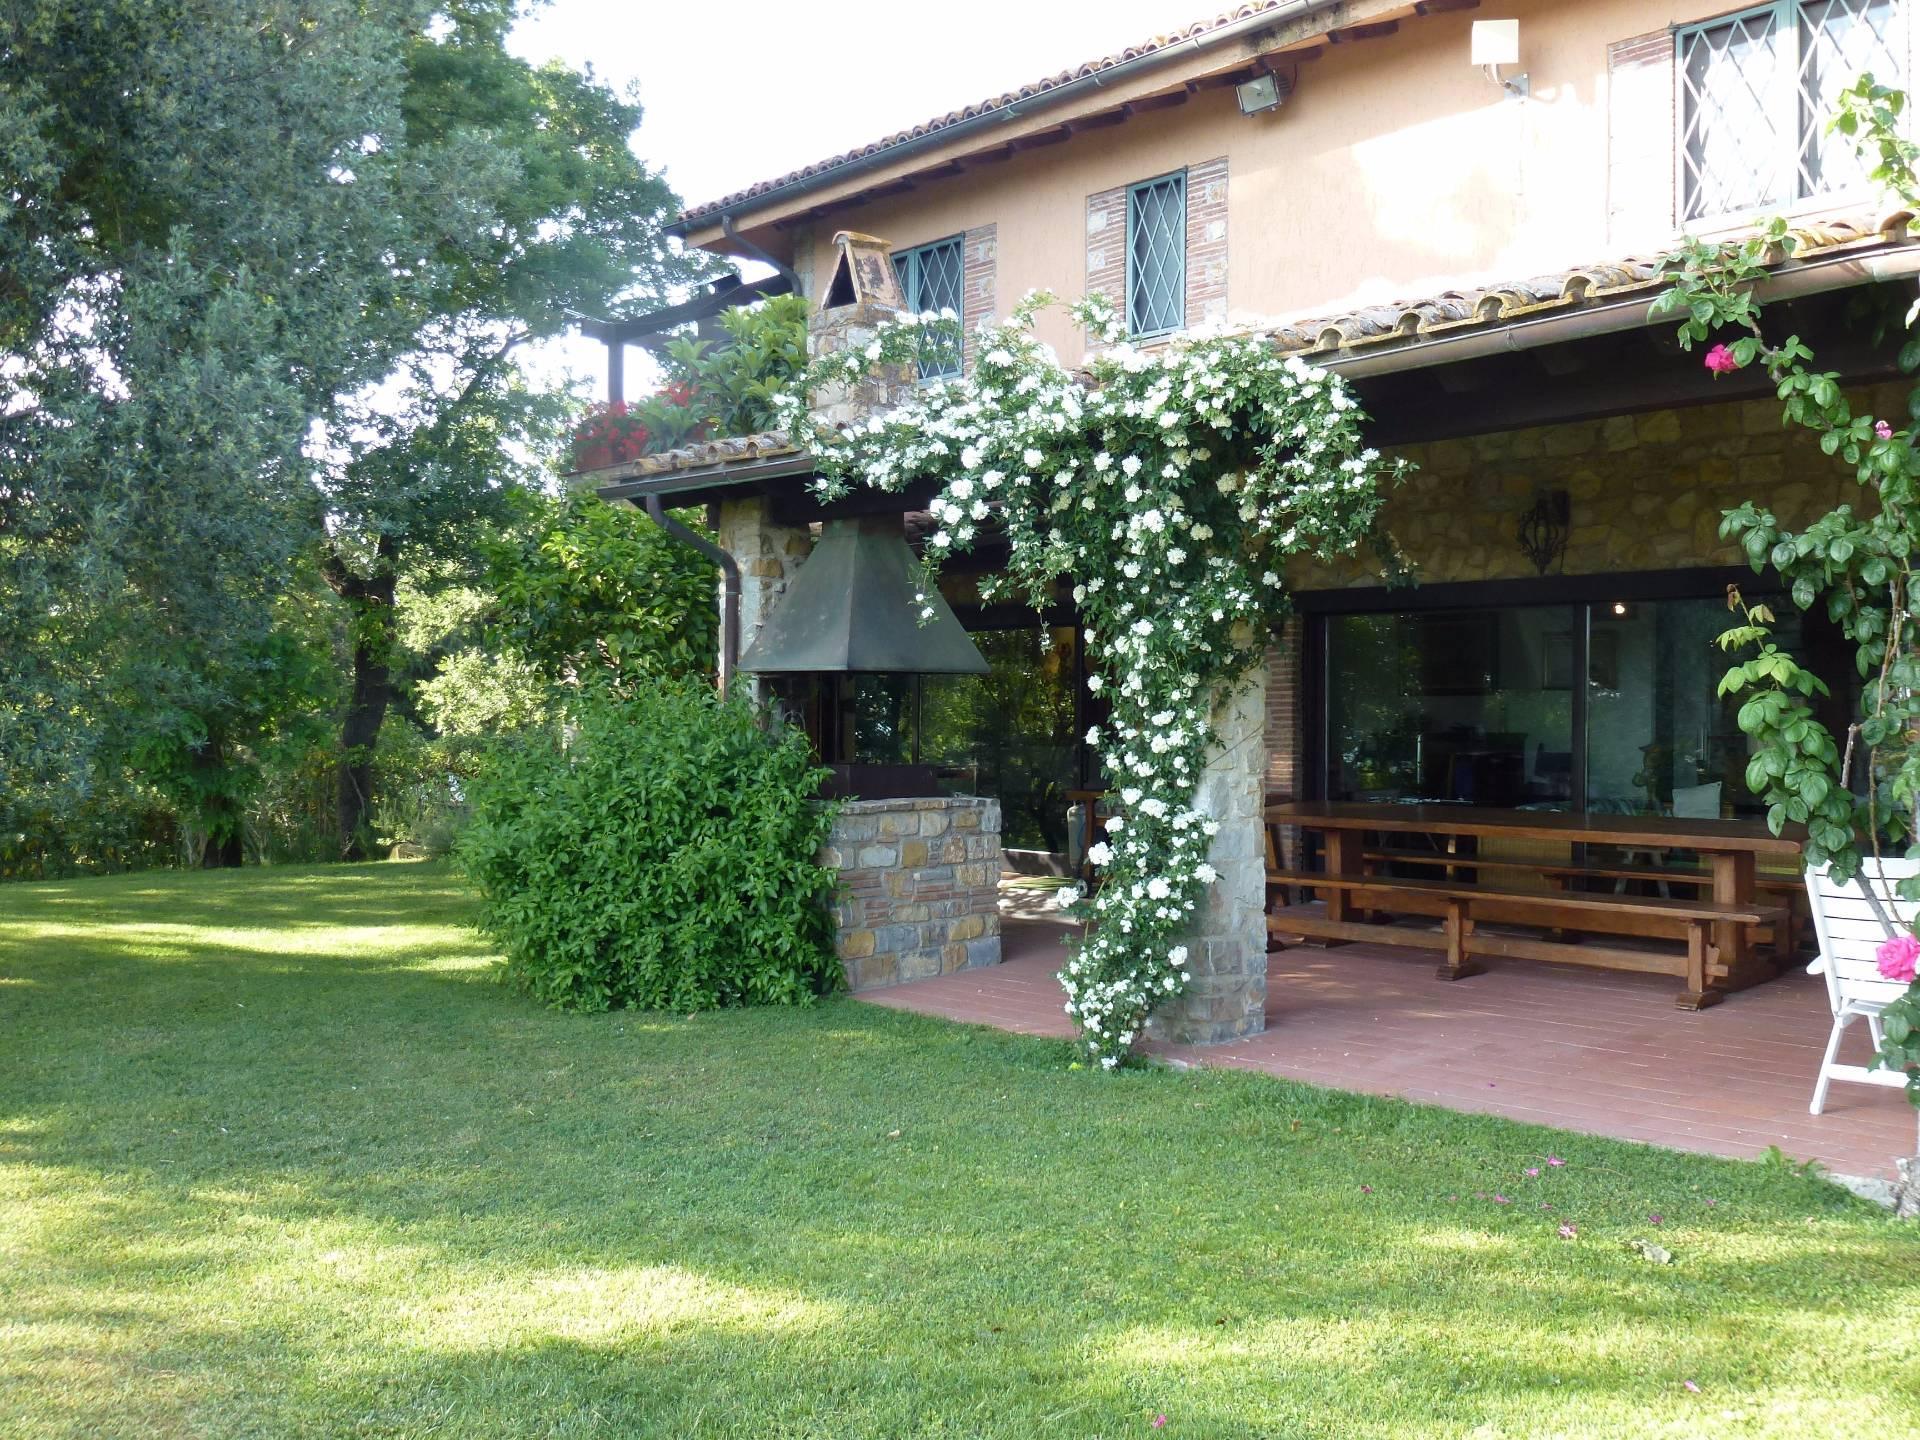 Splendida villa con viste mozzafiato del Monte Argentario - 2